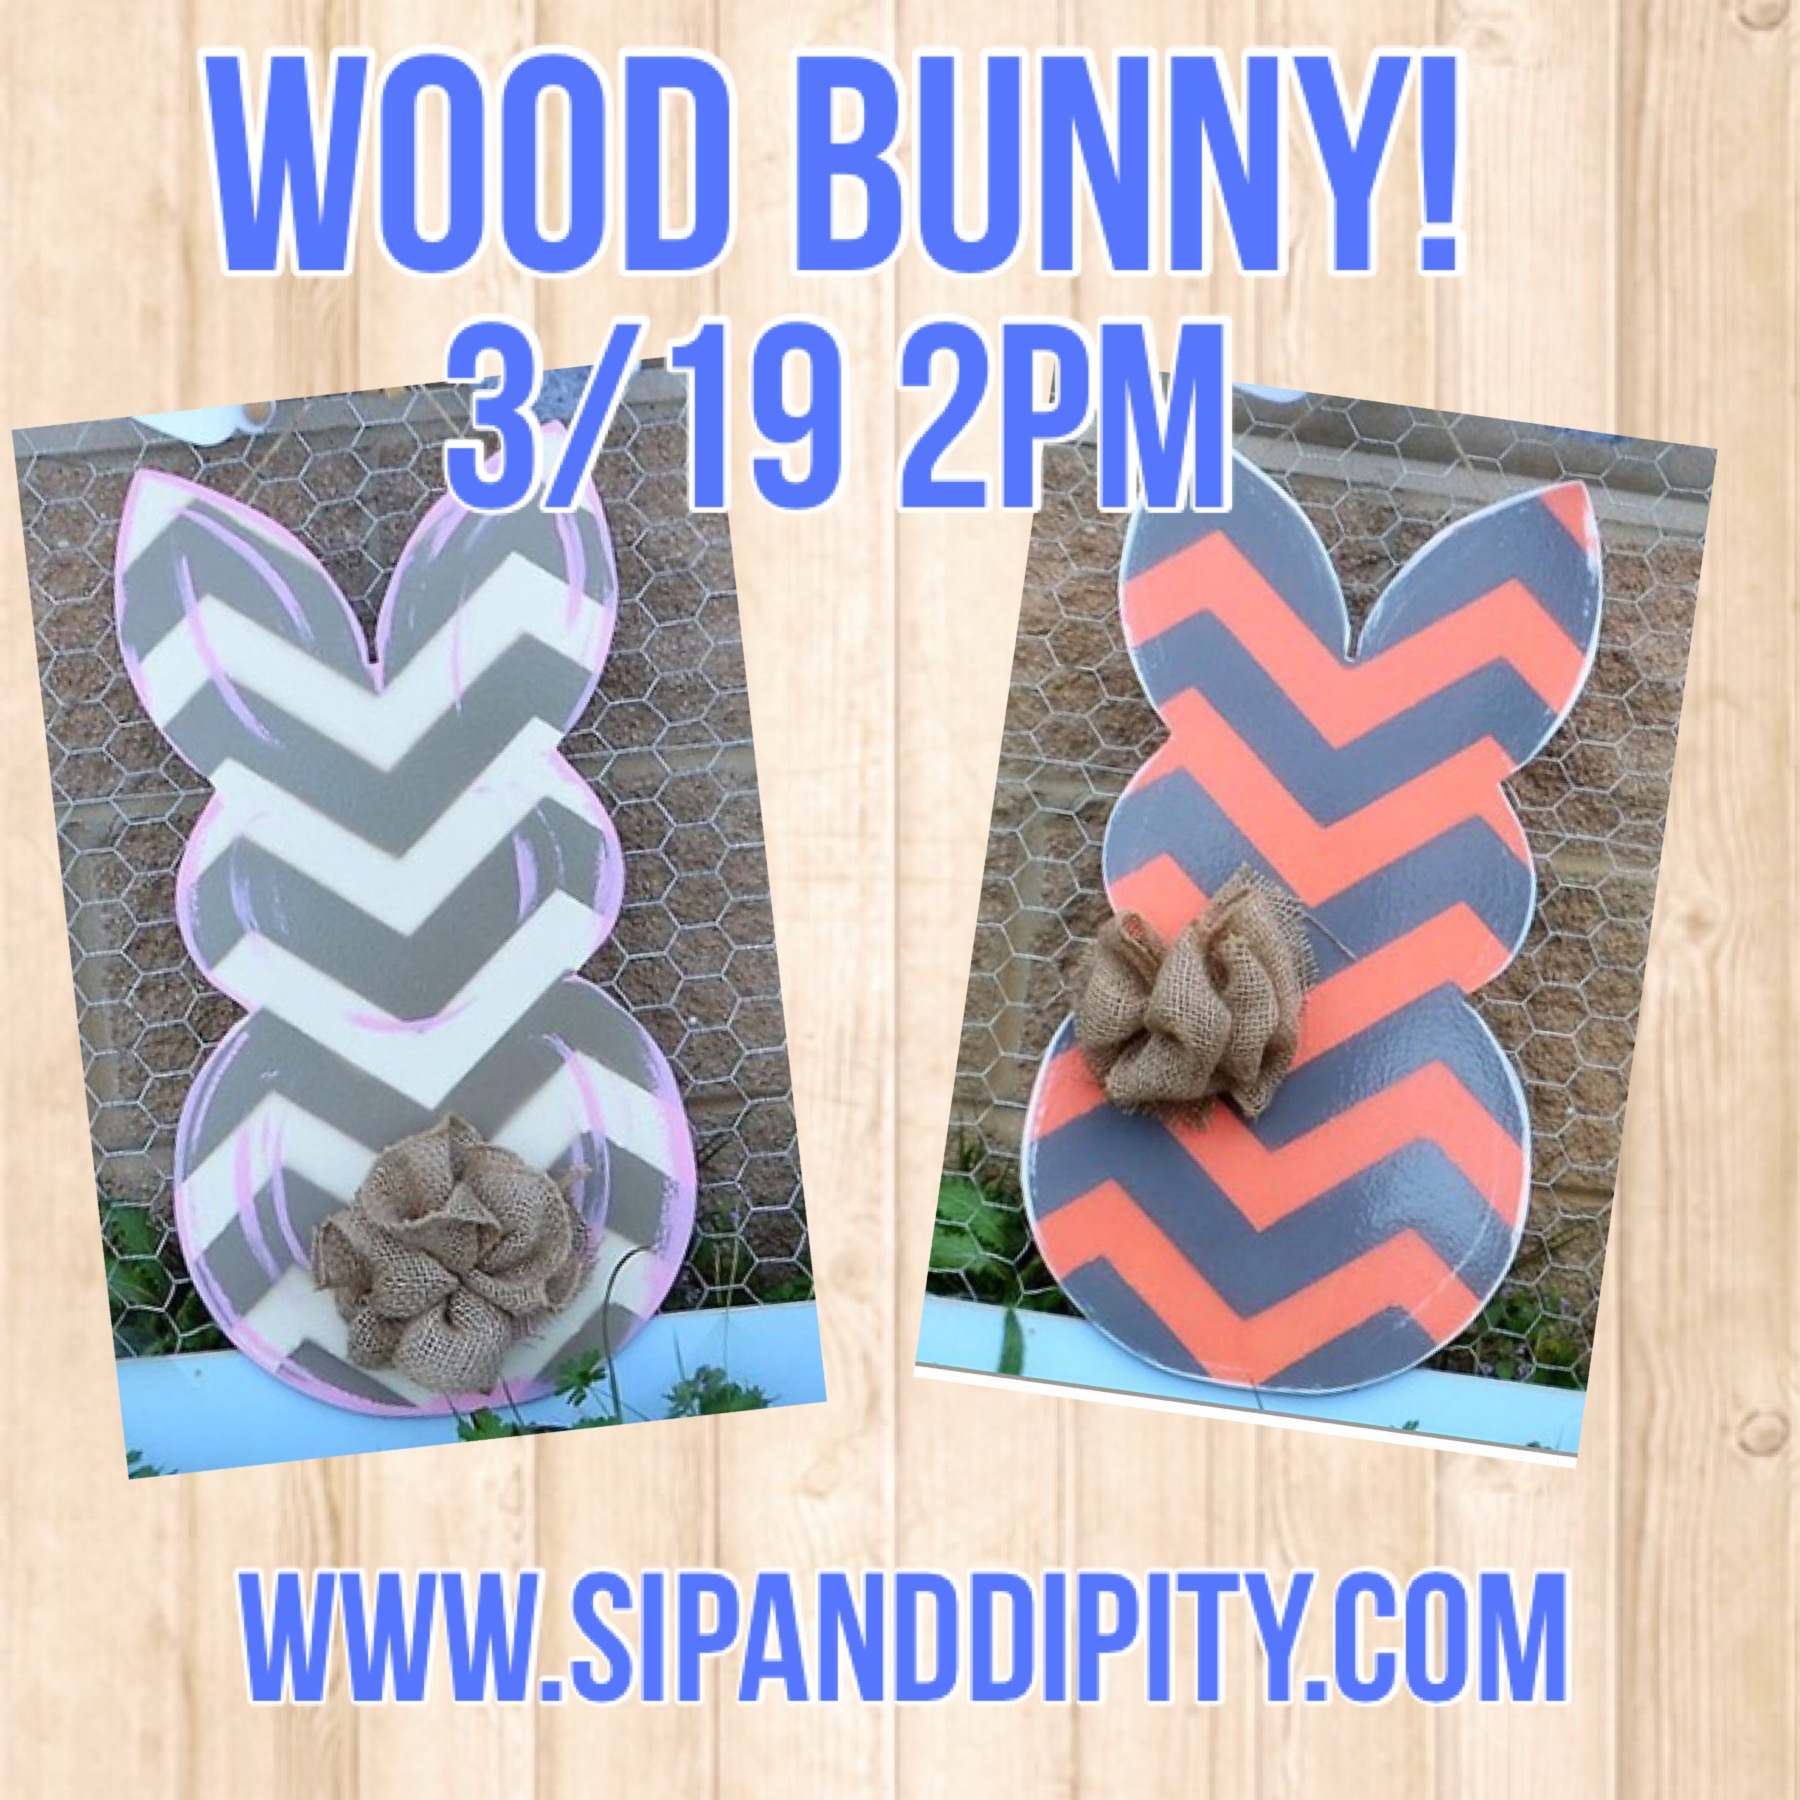 Wood Bunny!